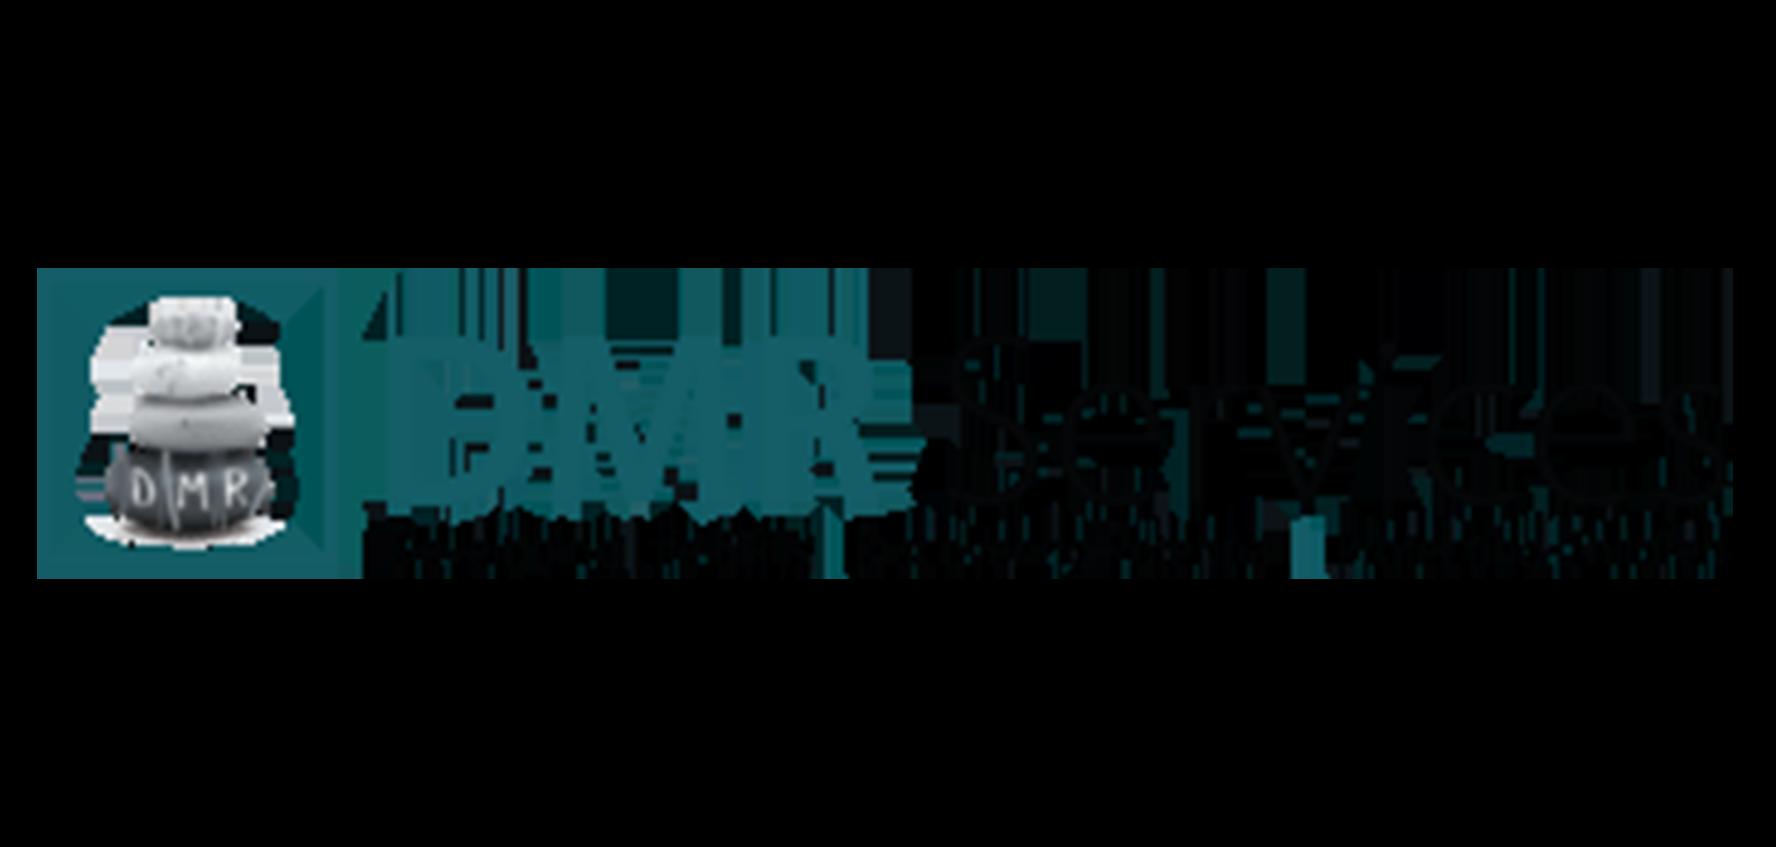 DMR_Services